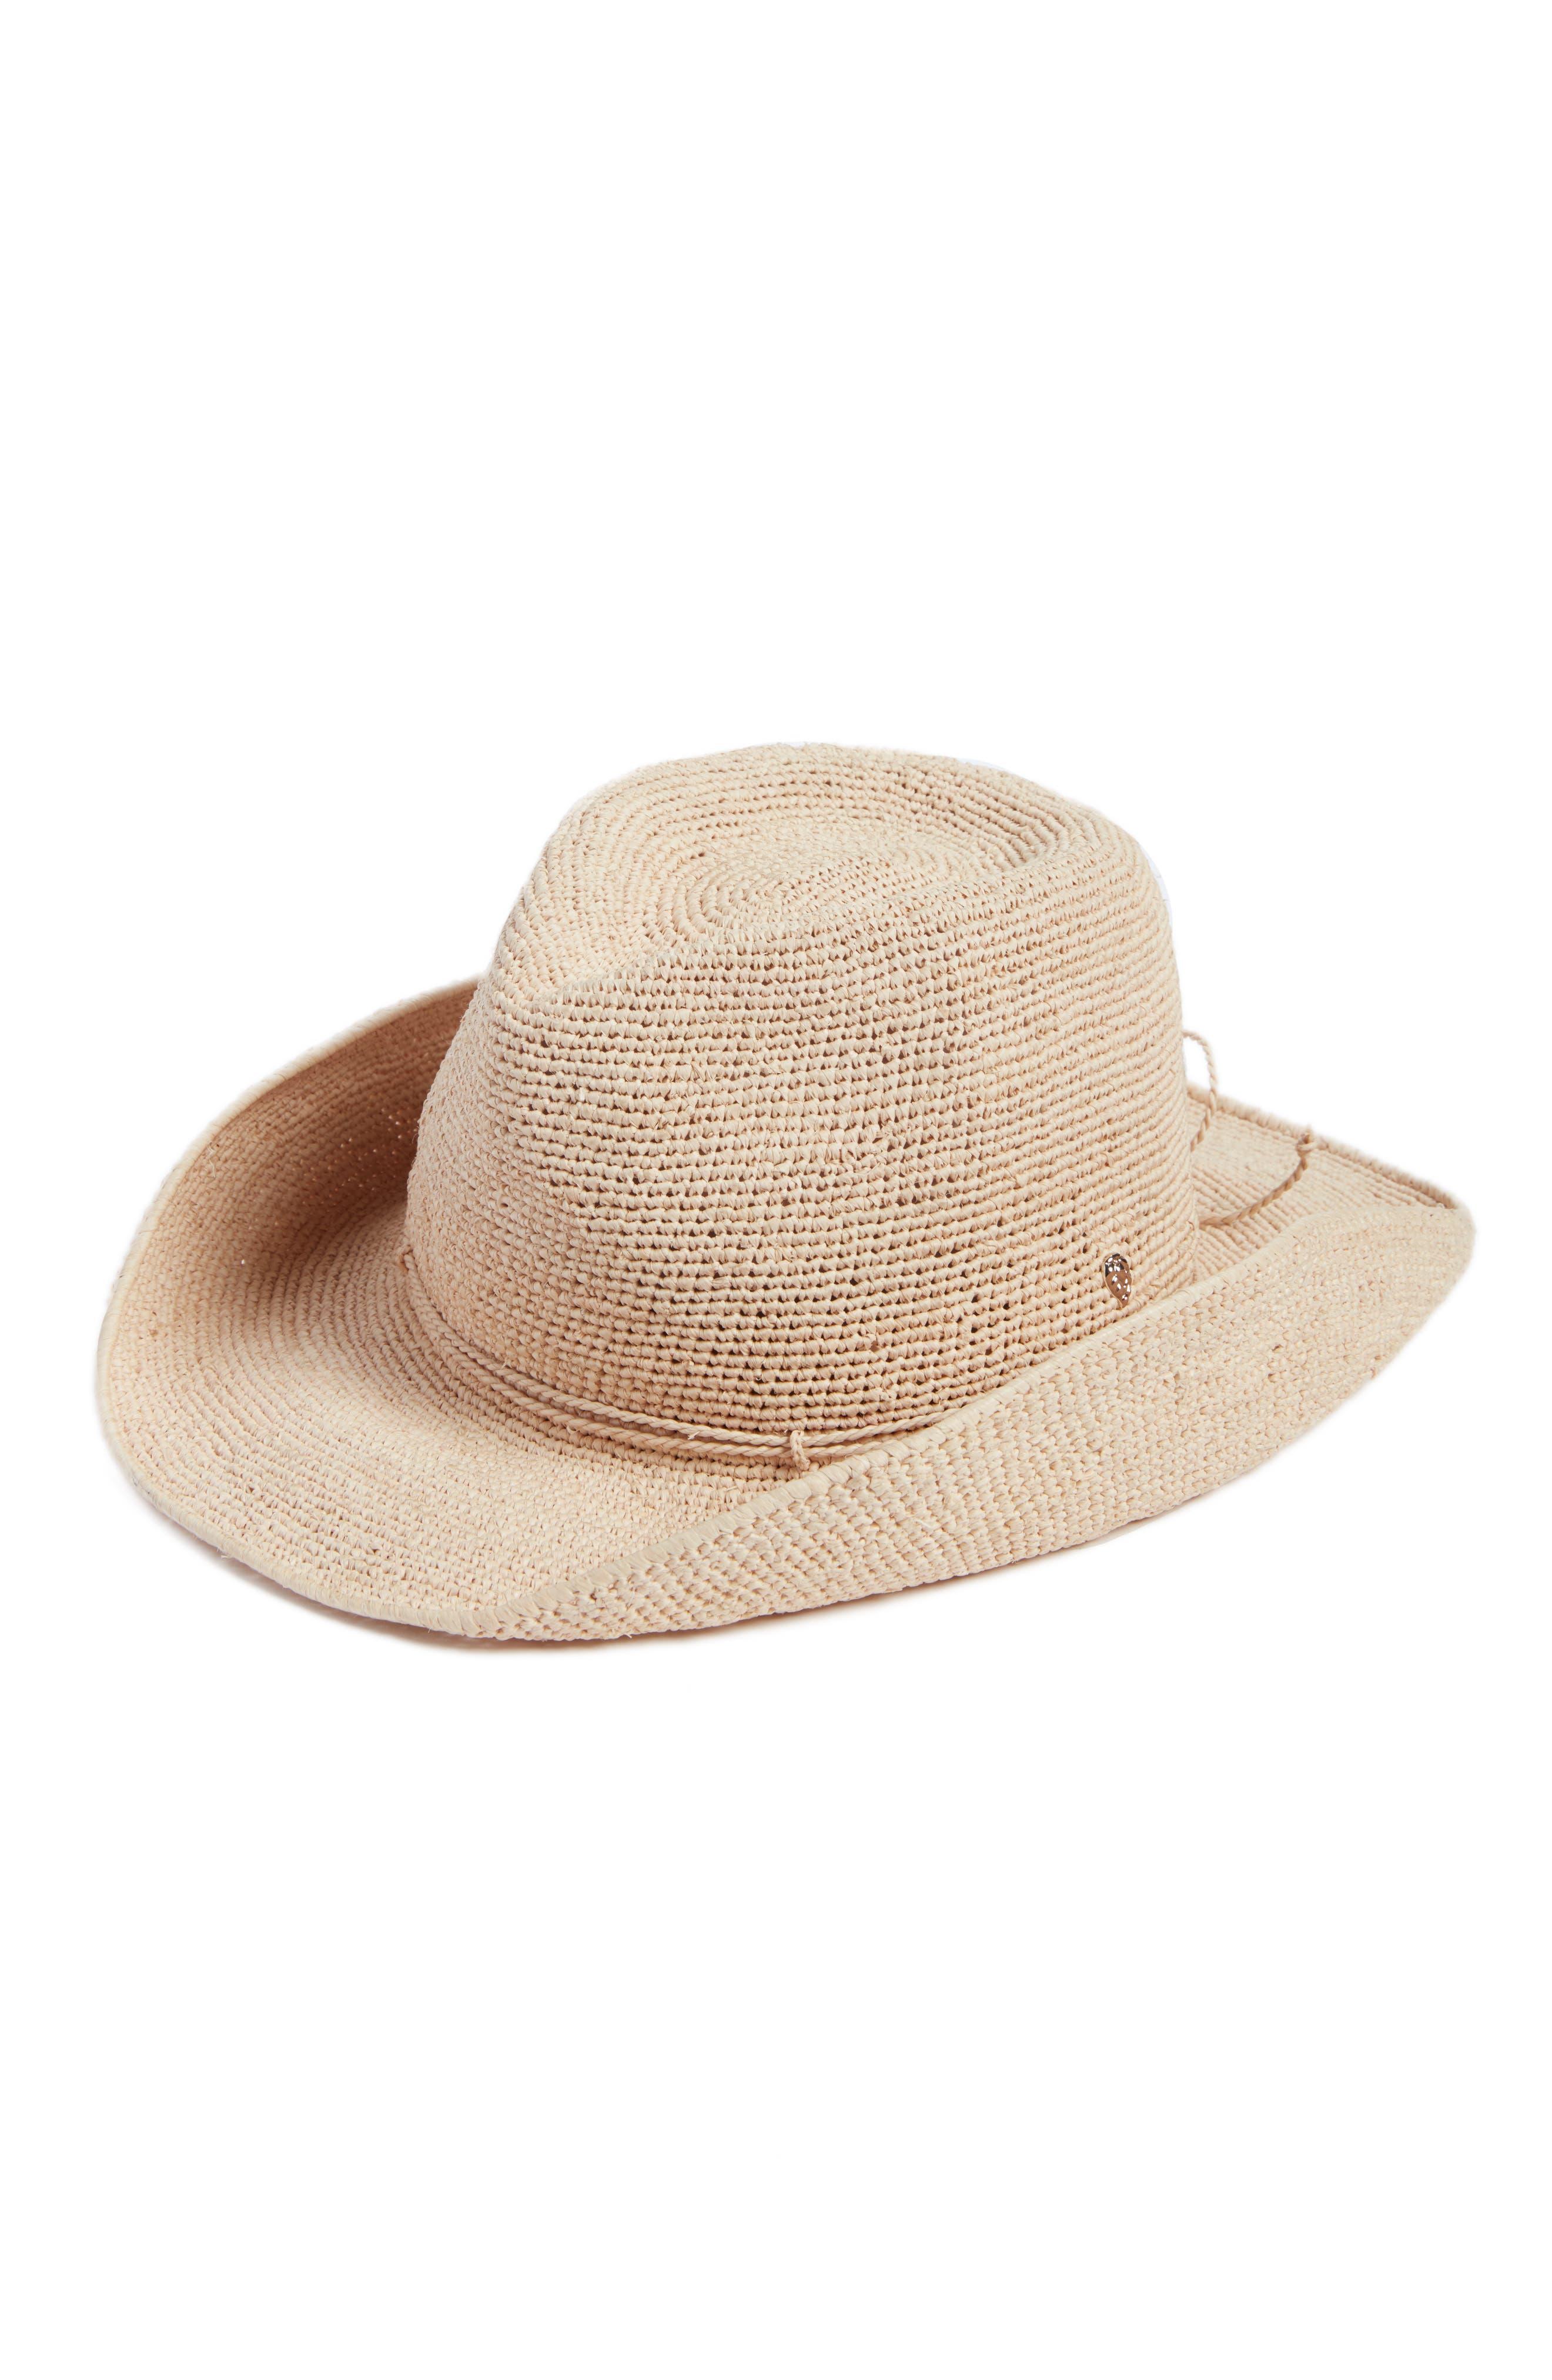 Belen Western Hat,                             Main thumbnail 1, color,                             NATURAL